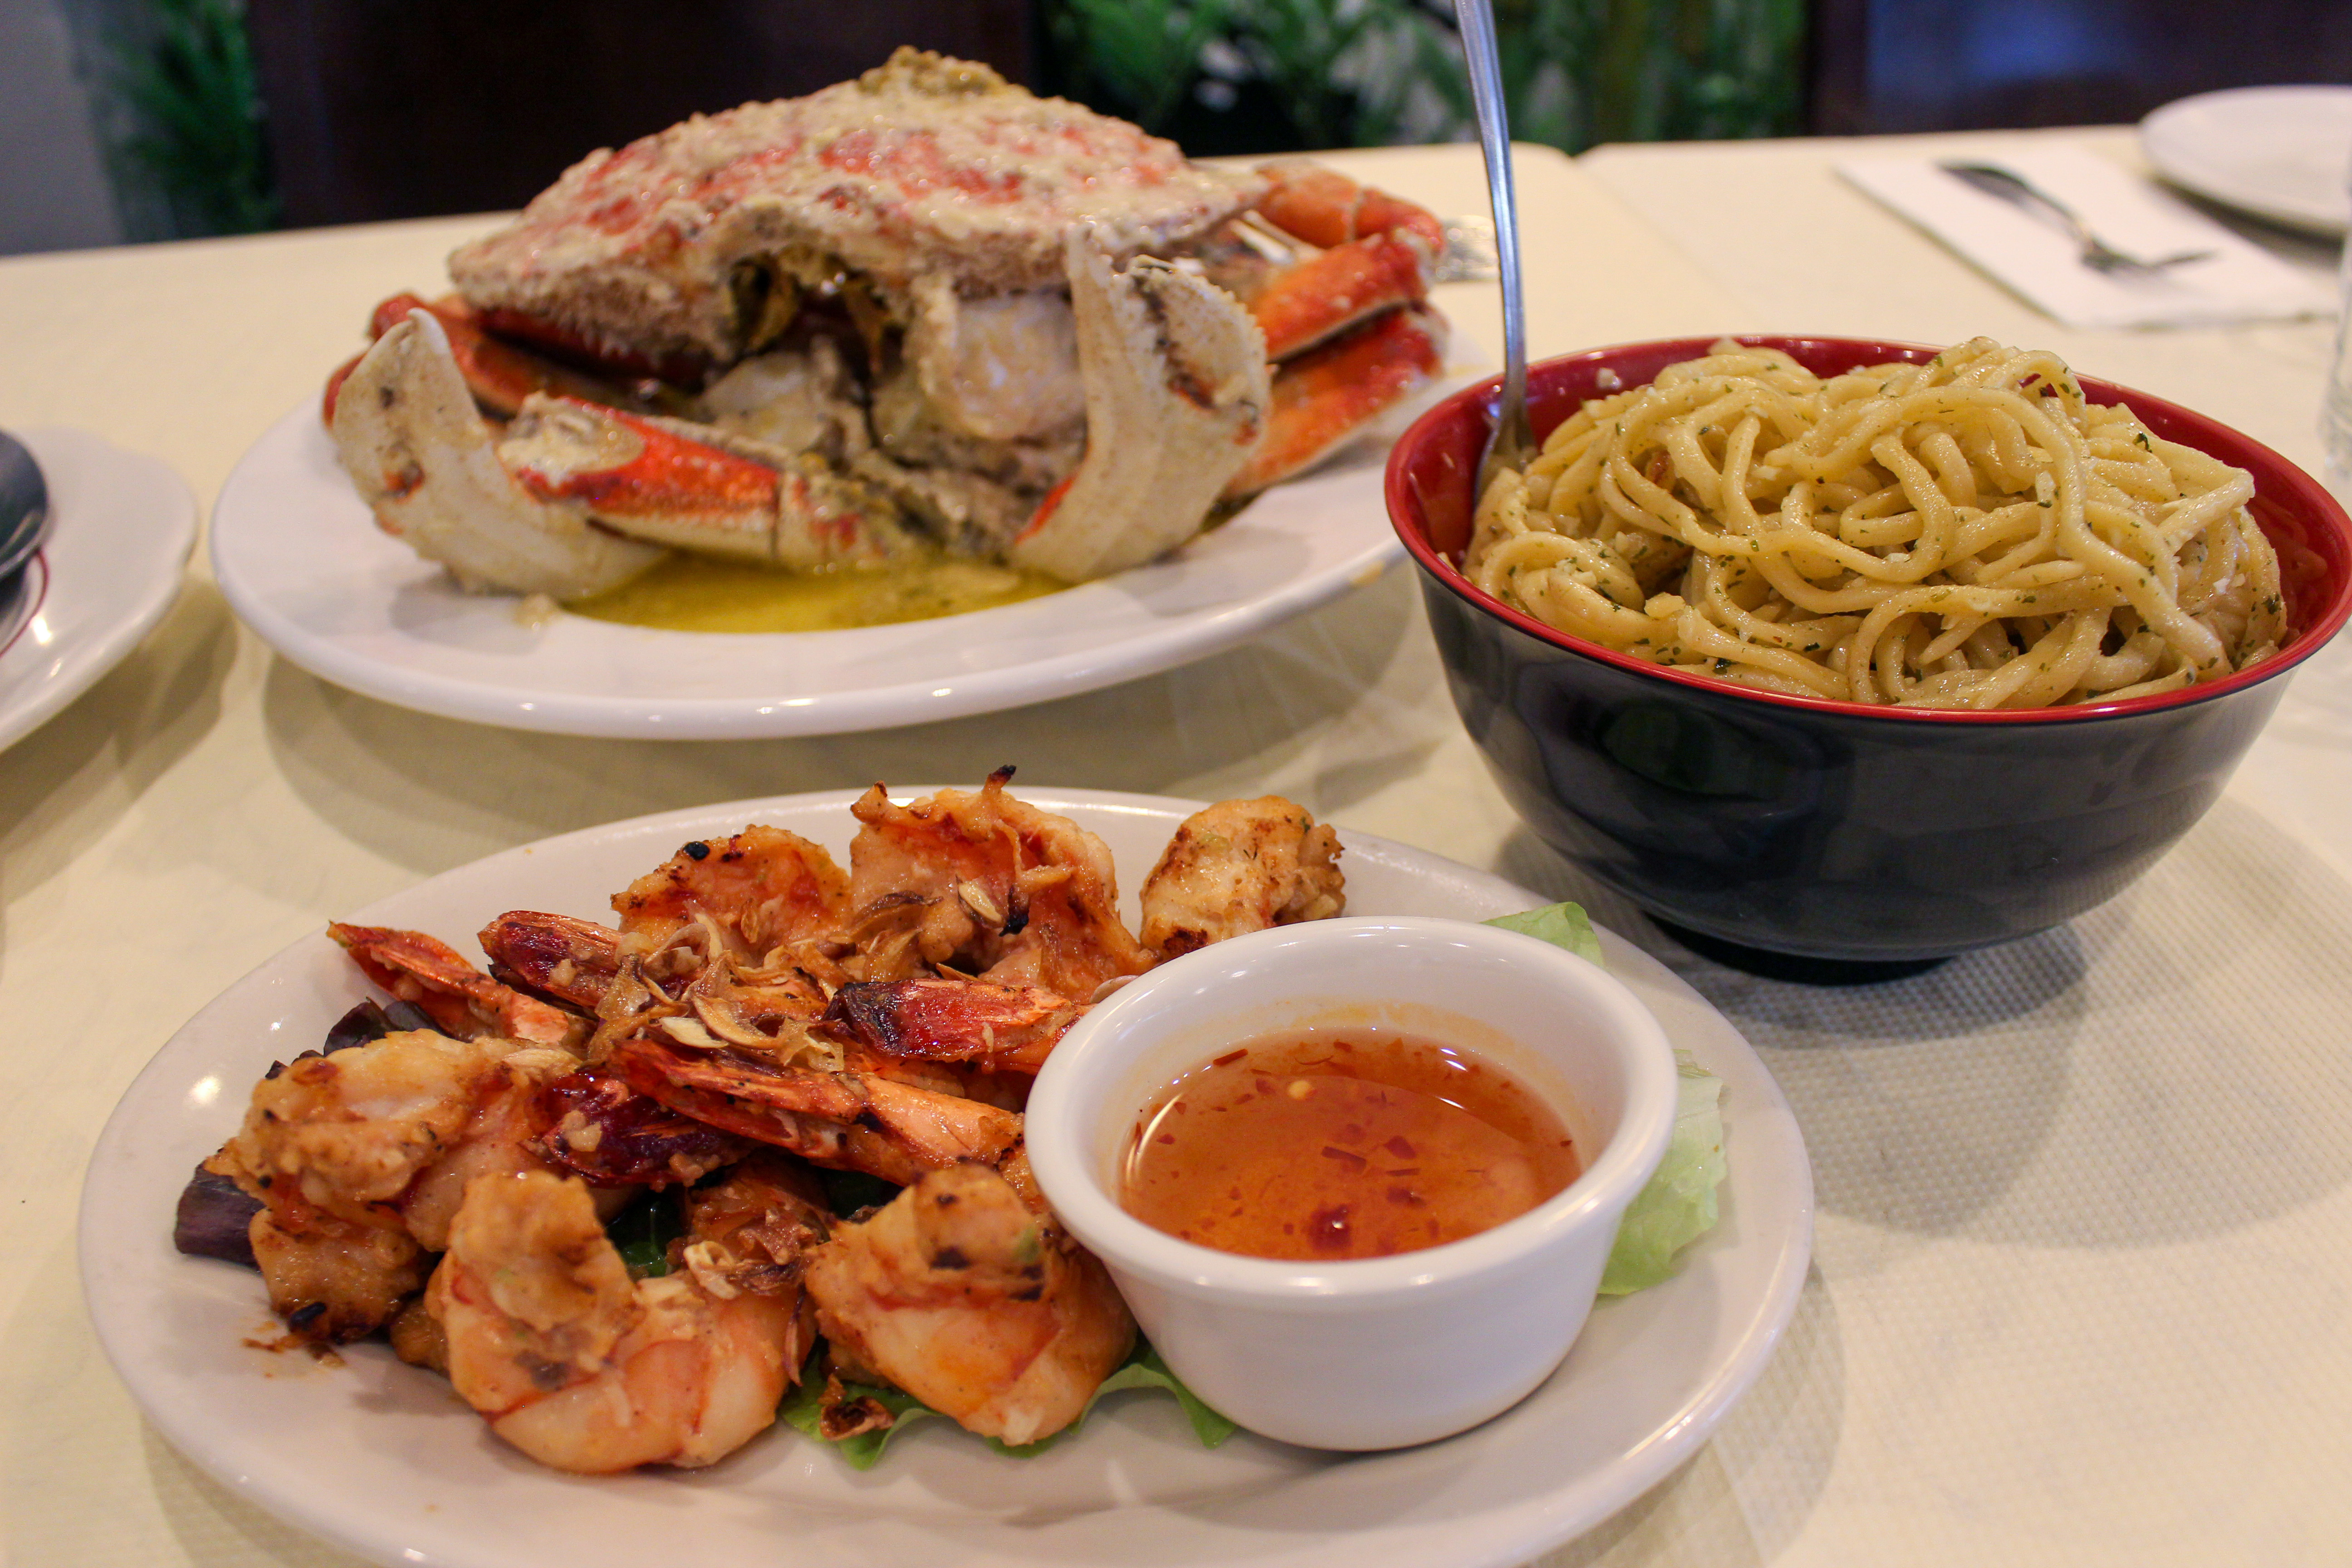 tiger prawns, garlic noodles, and roasted crab